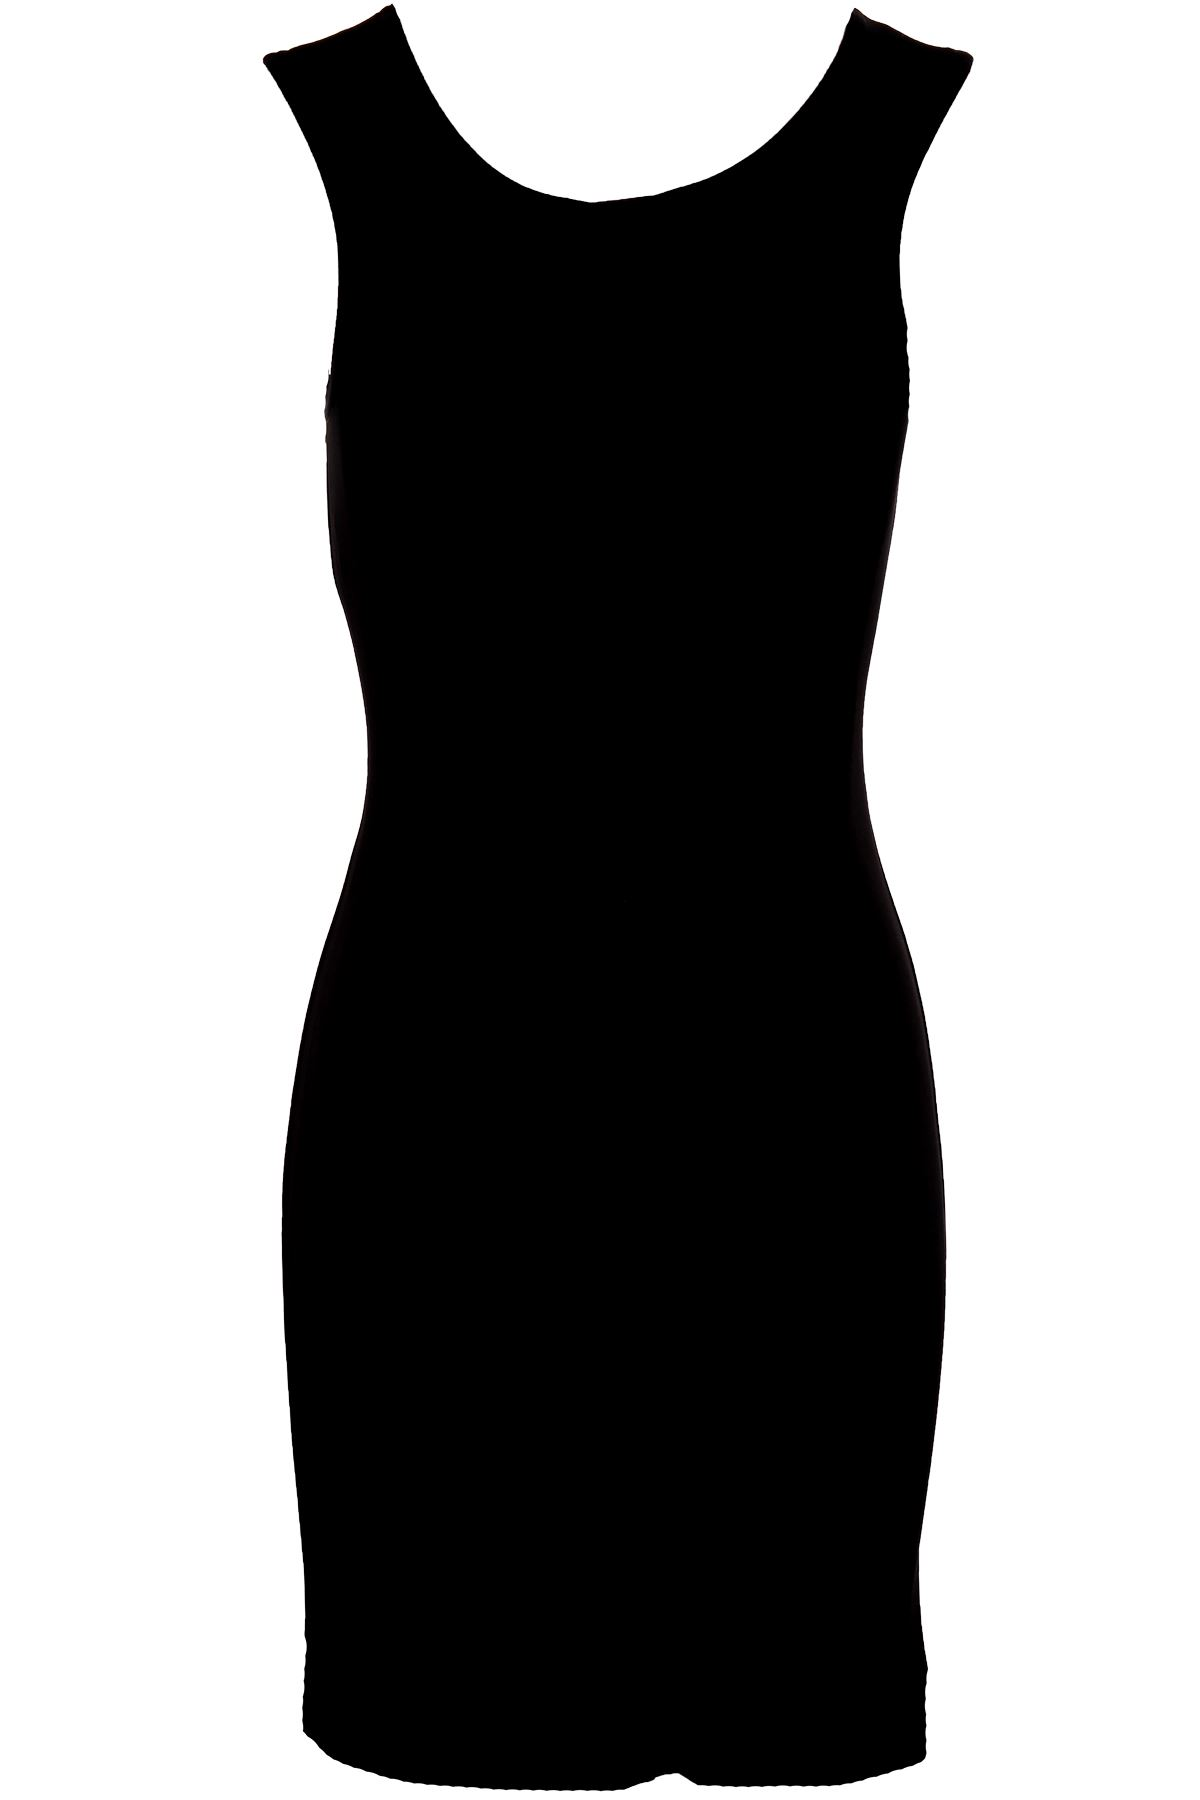 Ladies Sleeveless Black Foil Tribal Print Women's Evening Smart Bodycon Dress